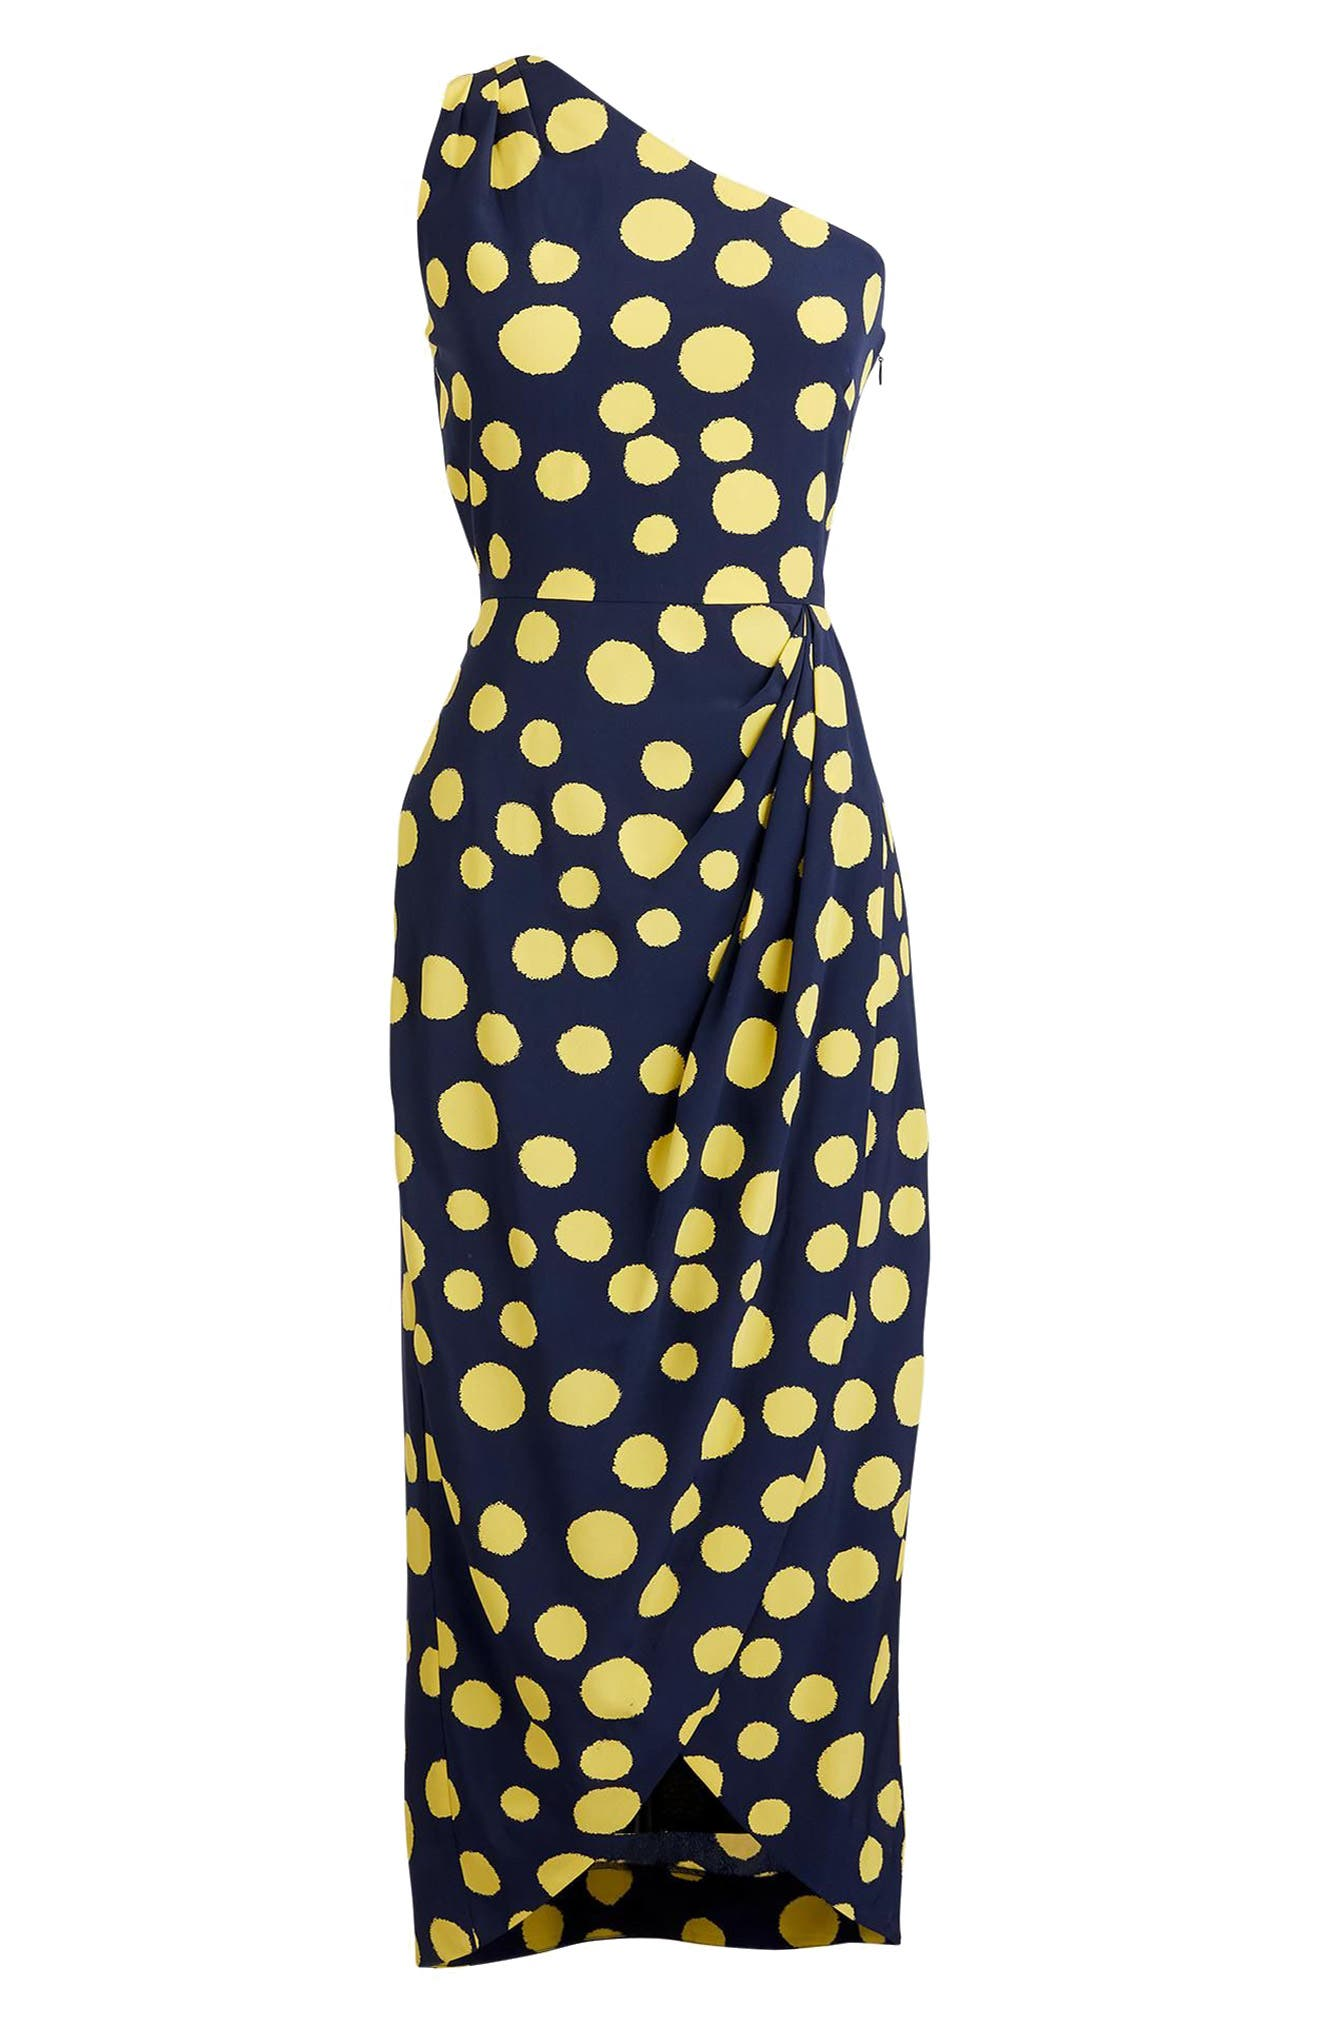 J.CREW,                             Polka Dot One-Shoulder Silk Dress,                             Alternate thumbnail 7, color,                             401